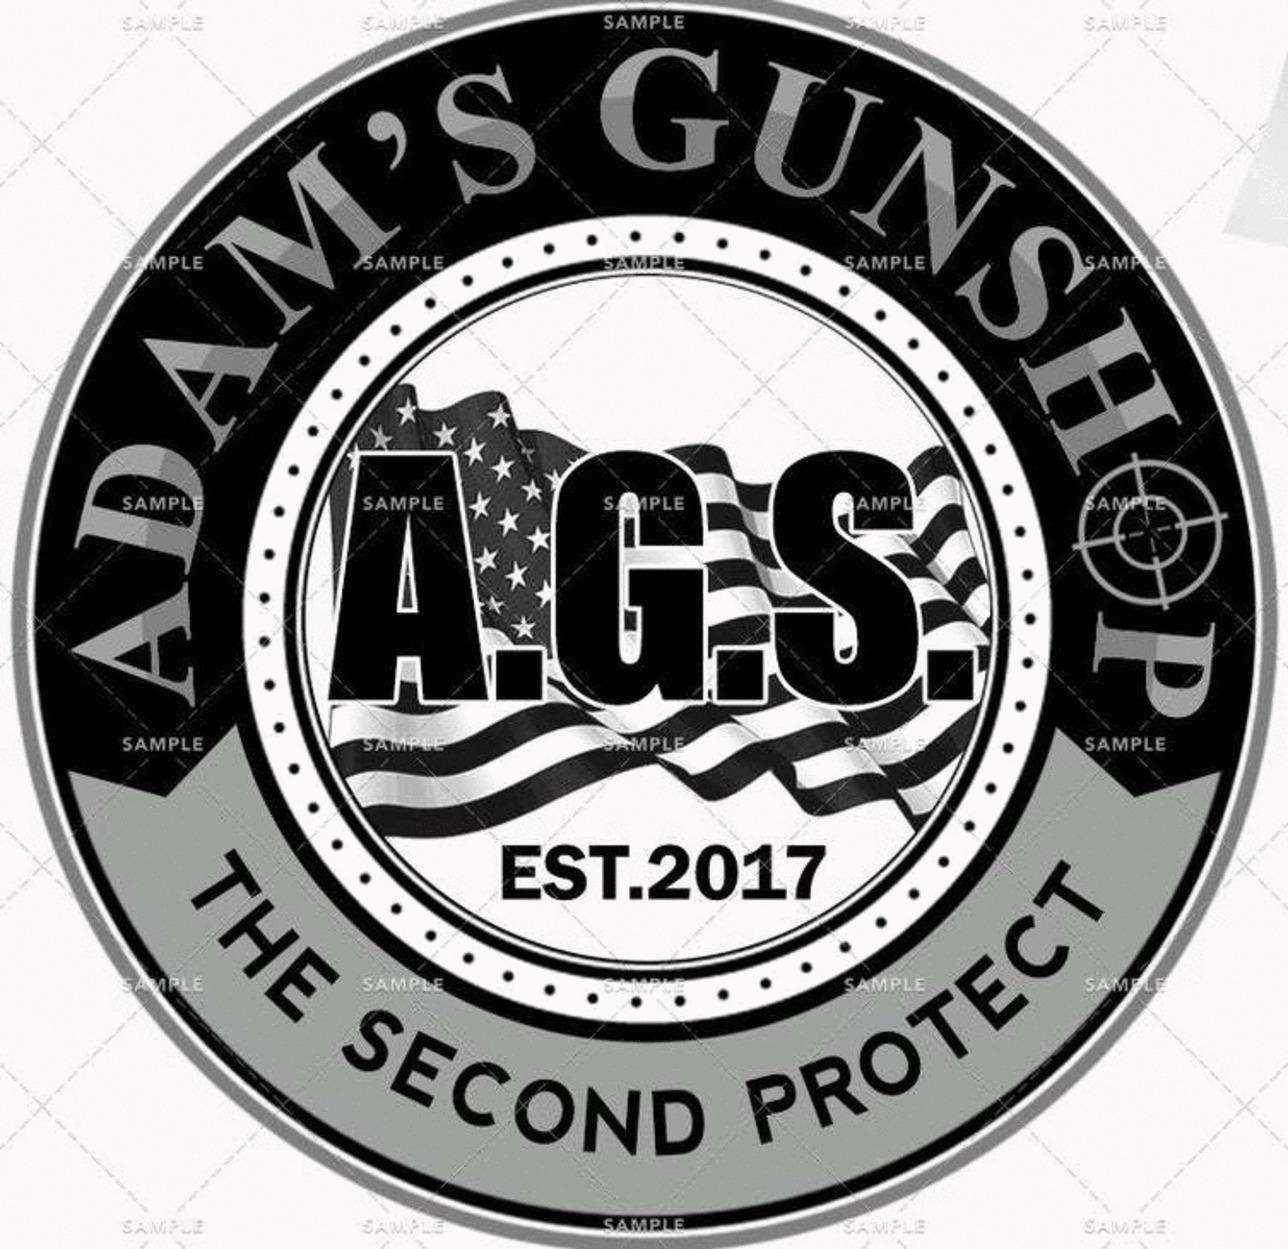 hk 81000381 adam s gun shop HK P90 kxwjaho5sruzsse3gikk